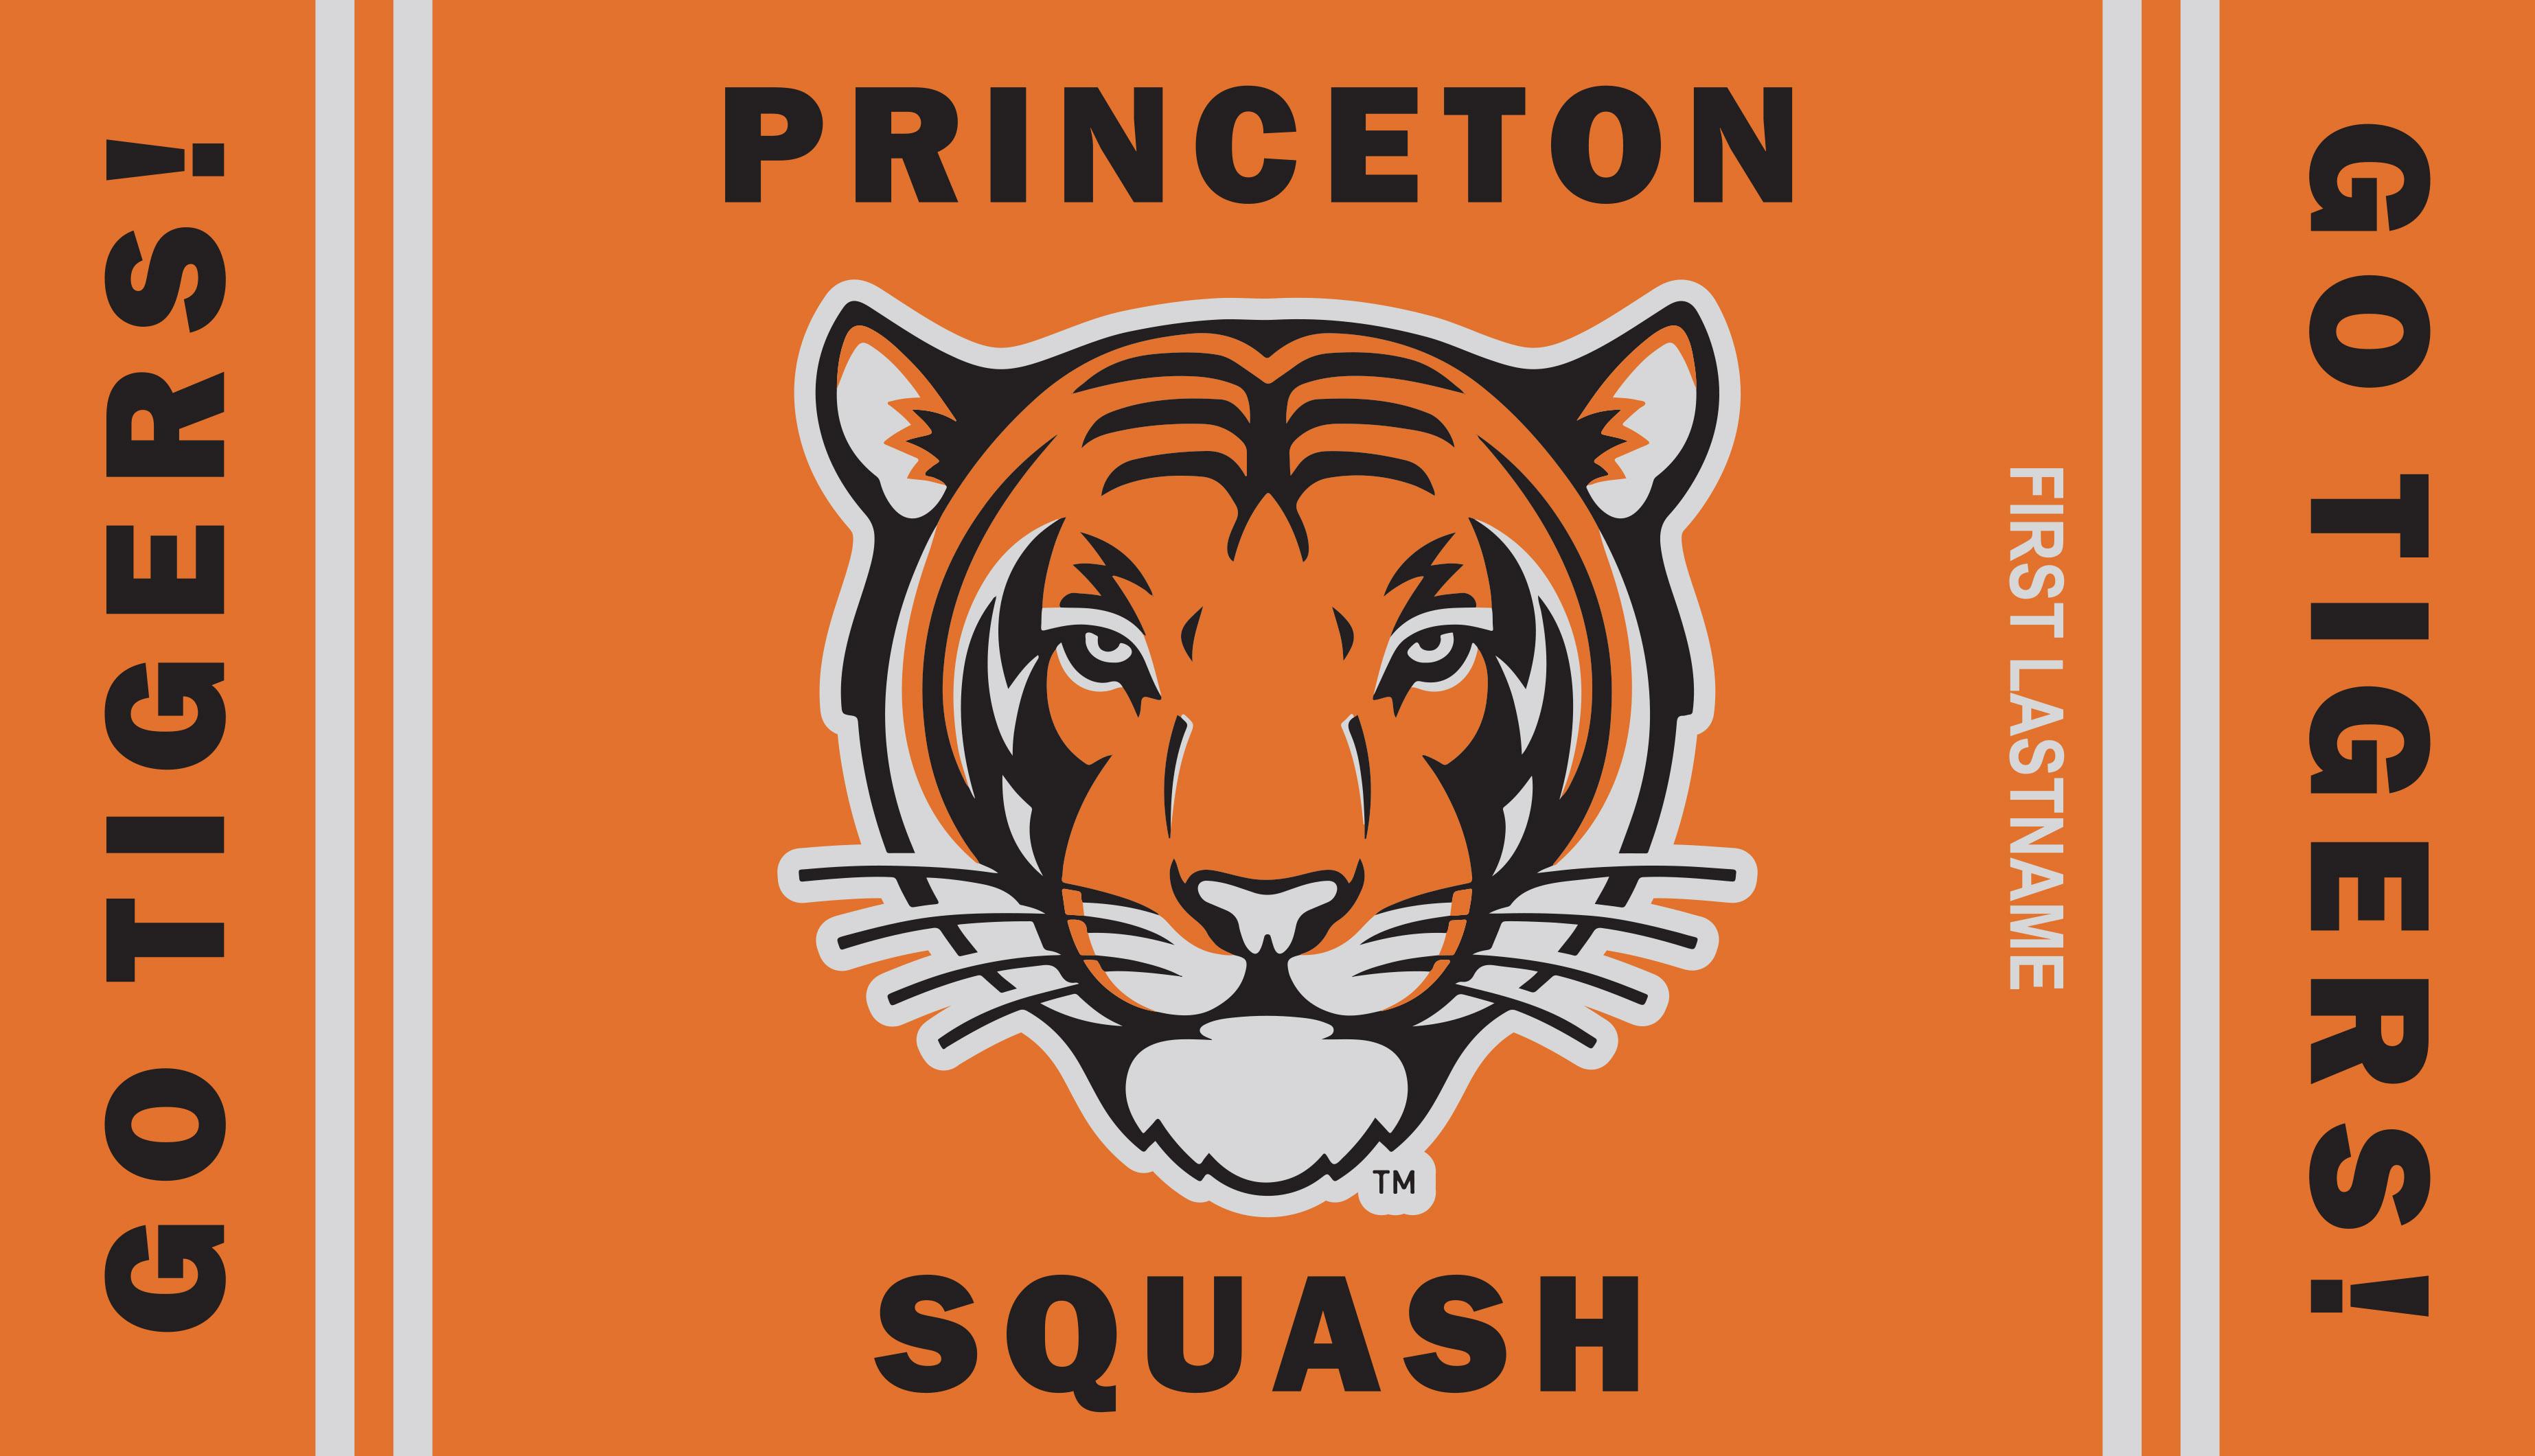 00665-PrincetonSquash-34x60_V2-PROOF